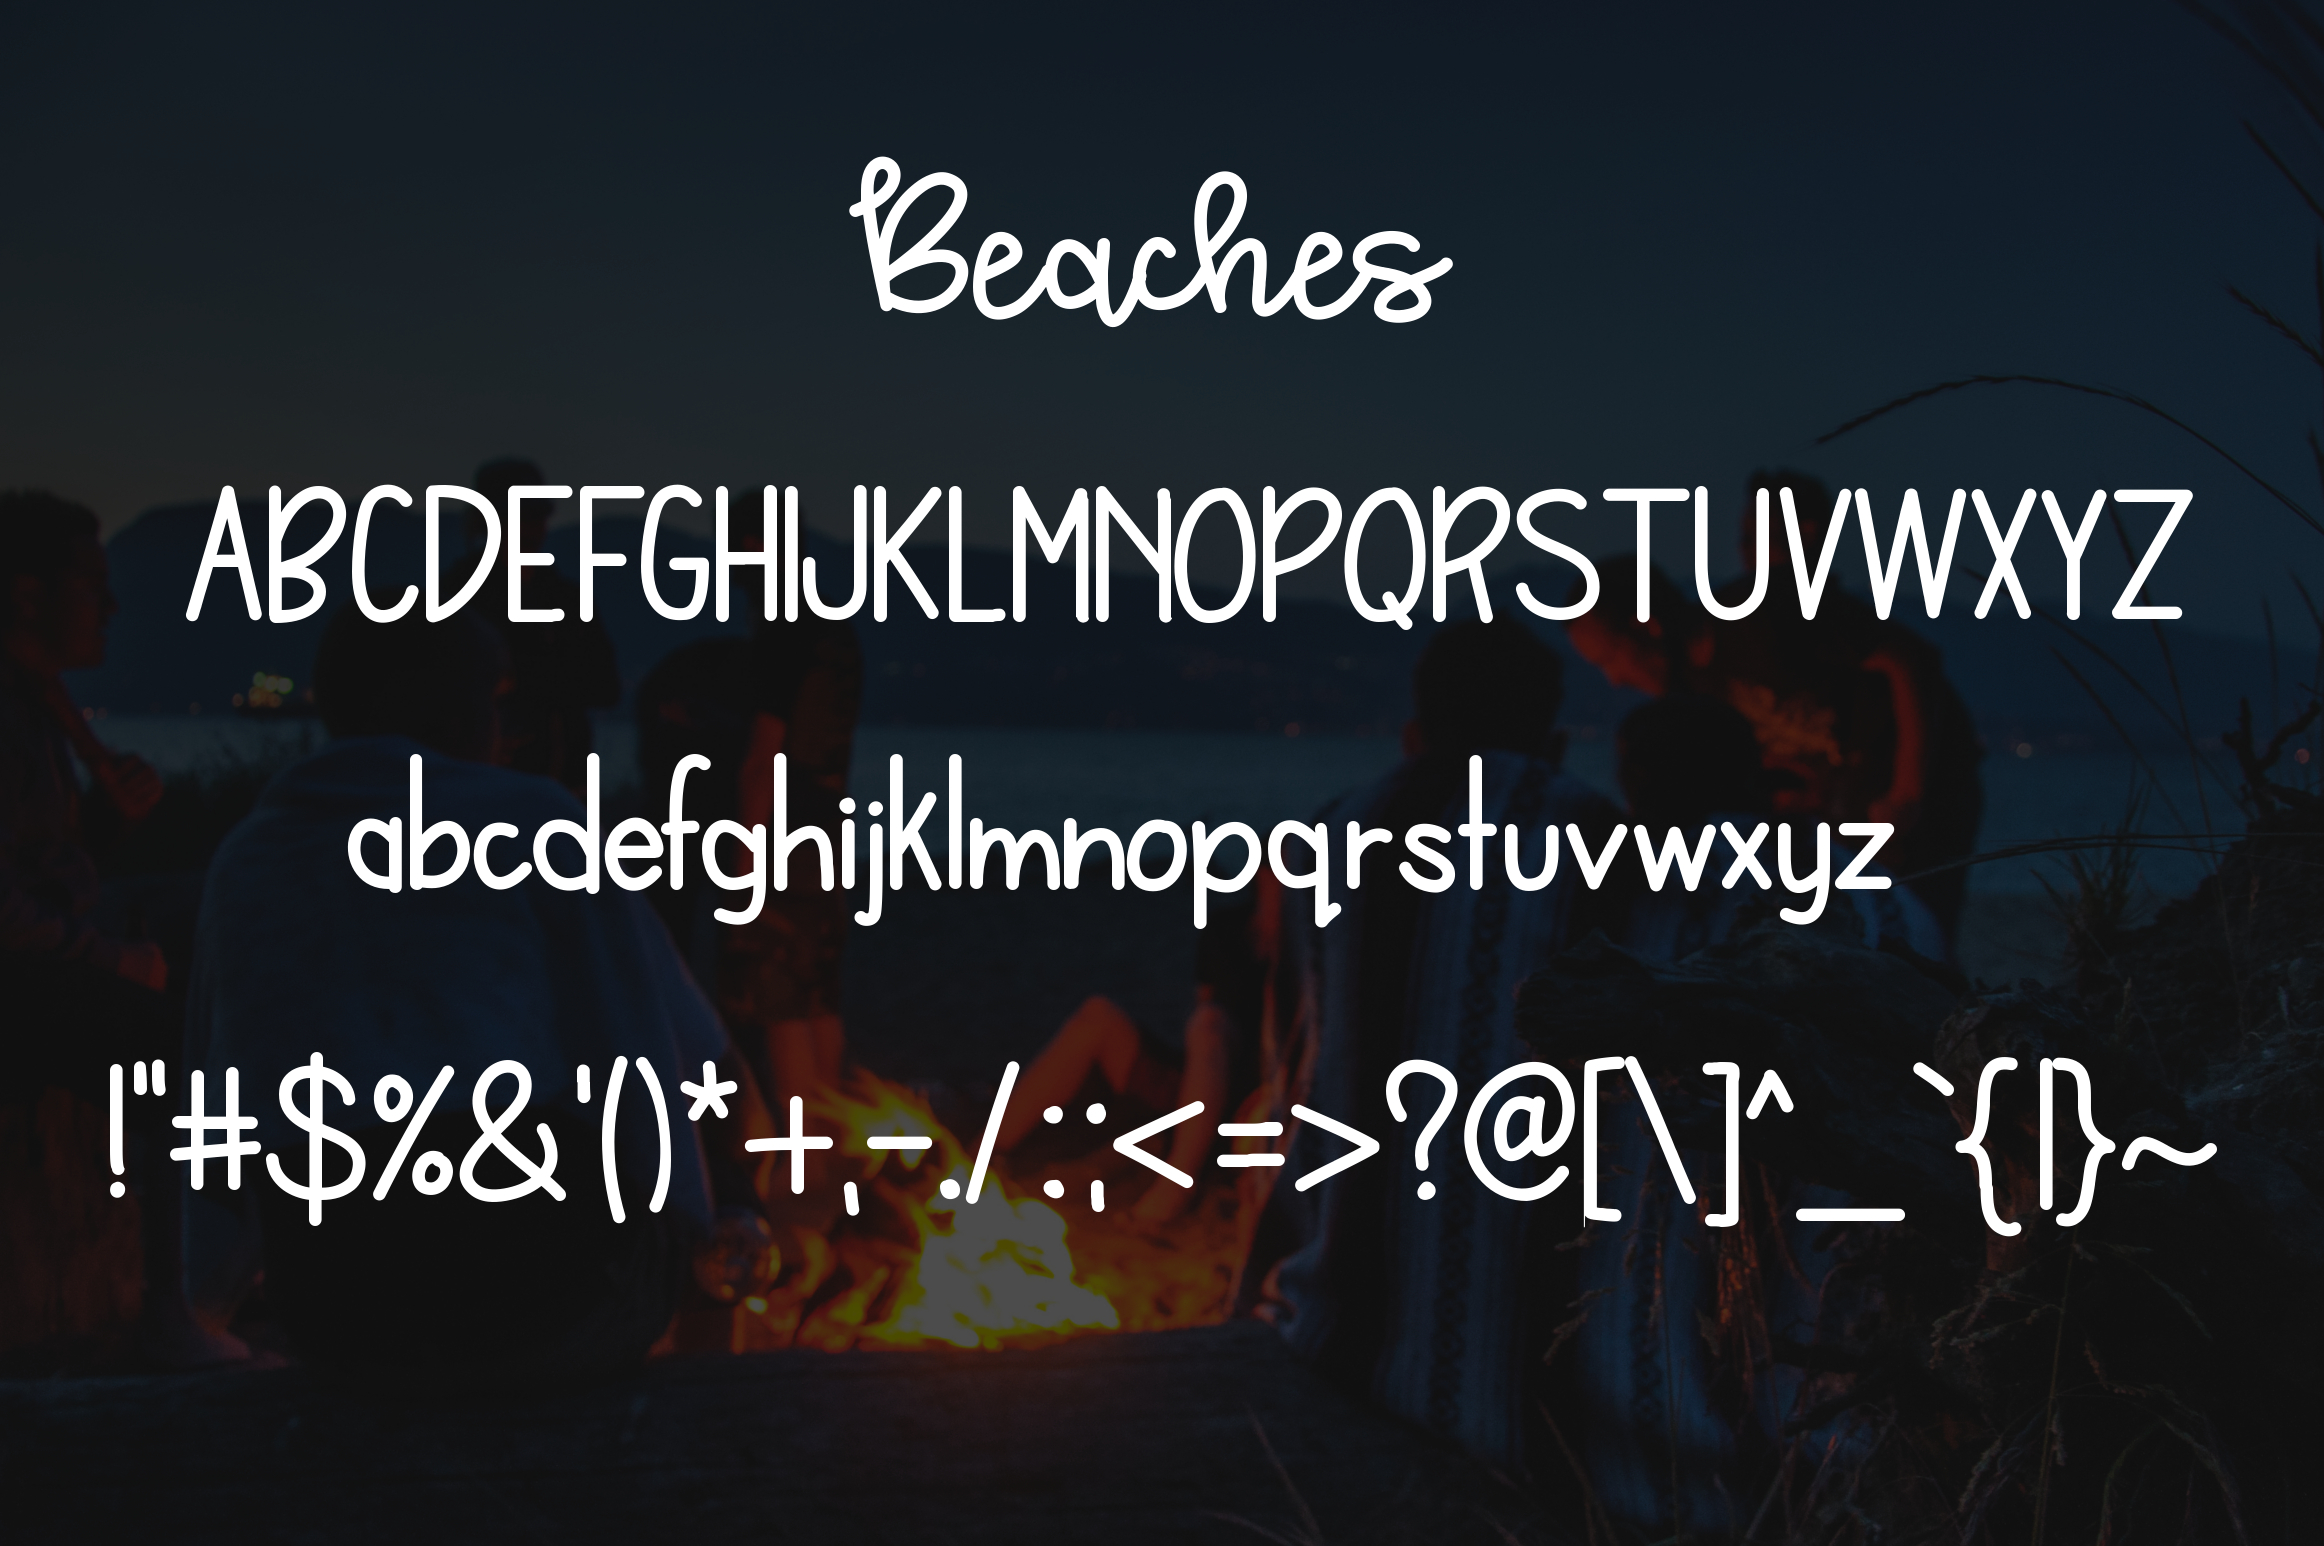 Bonfires & Beaches a Font Duo example image 3